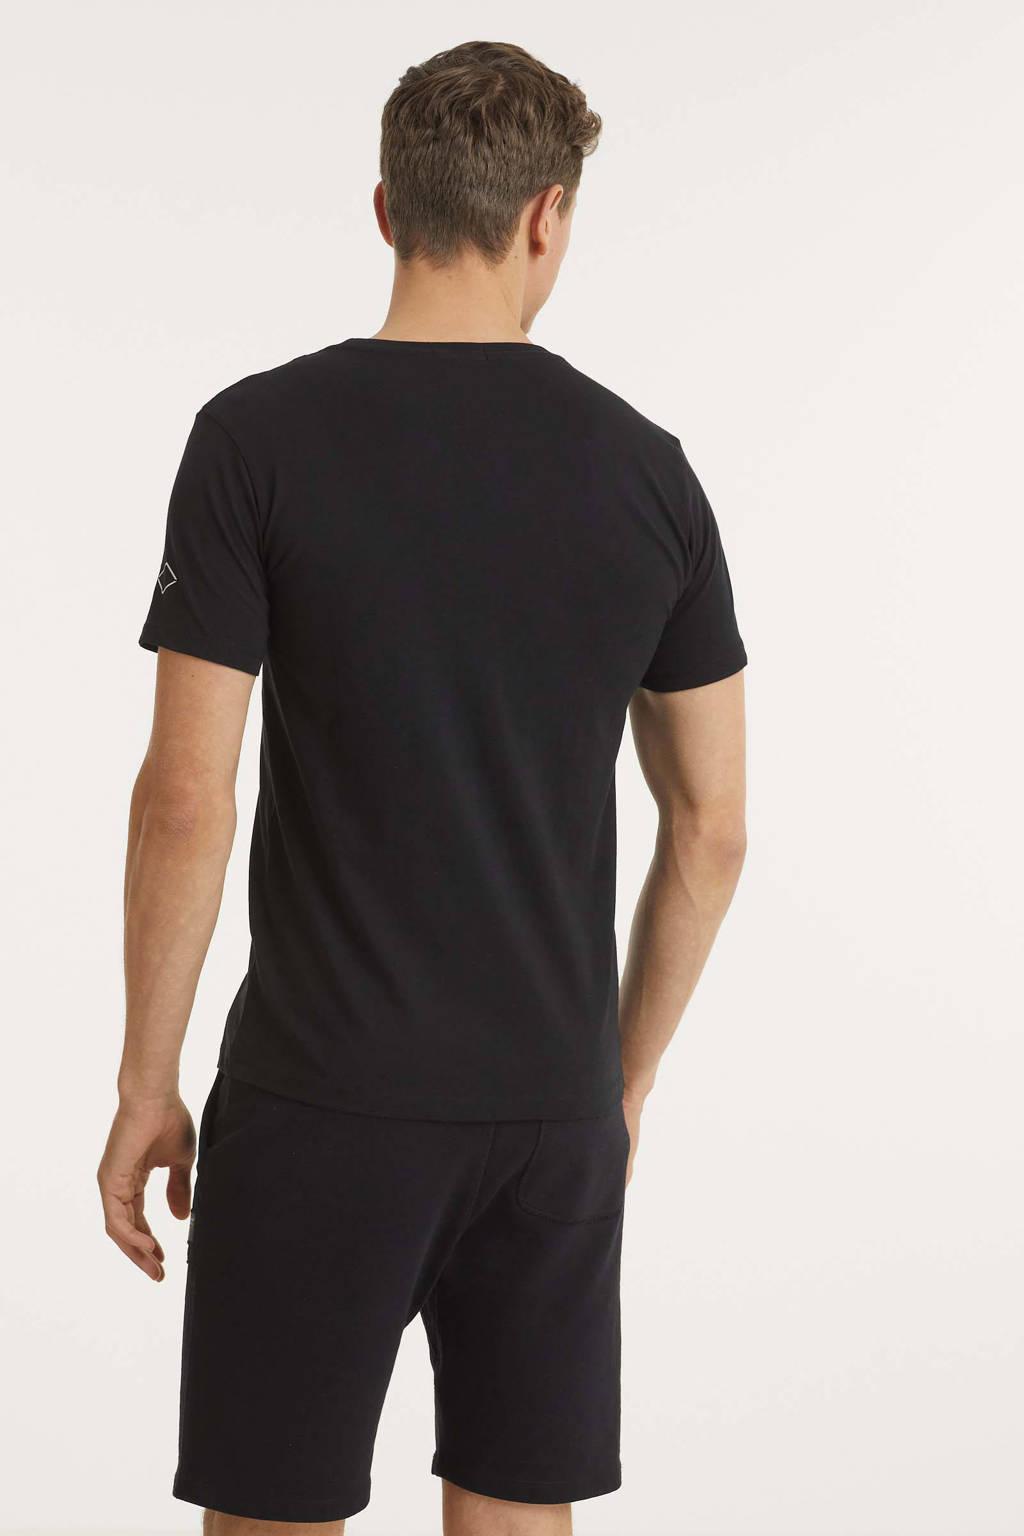 REPLAY T-shirt met logo zwart, Zwart